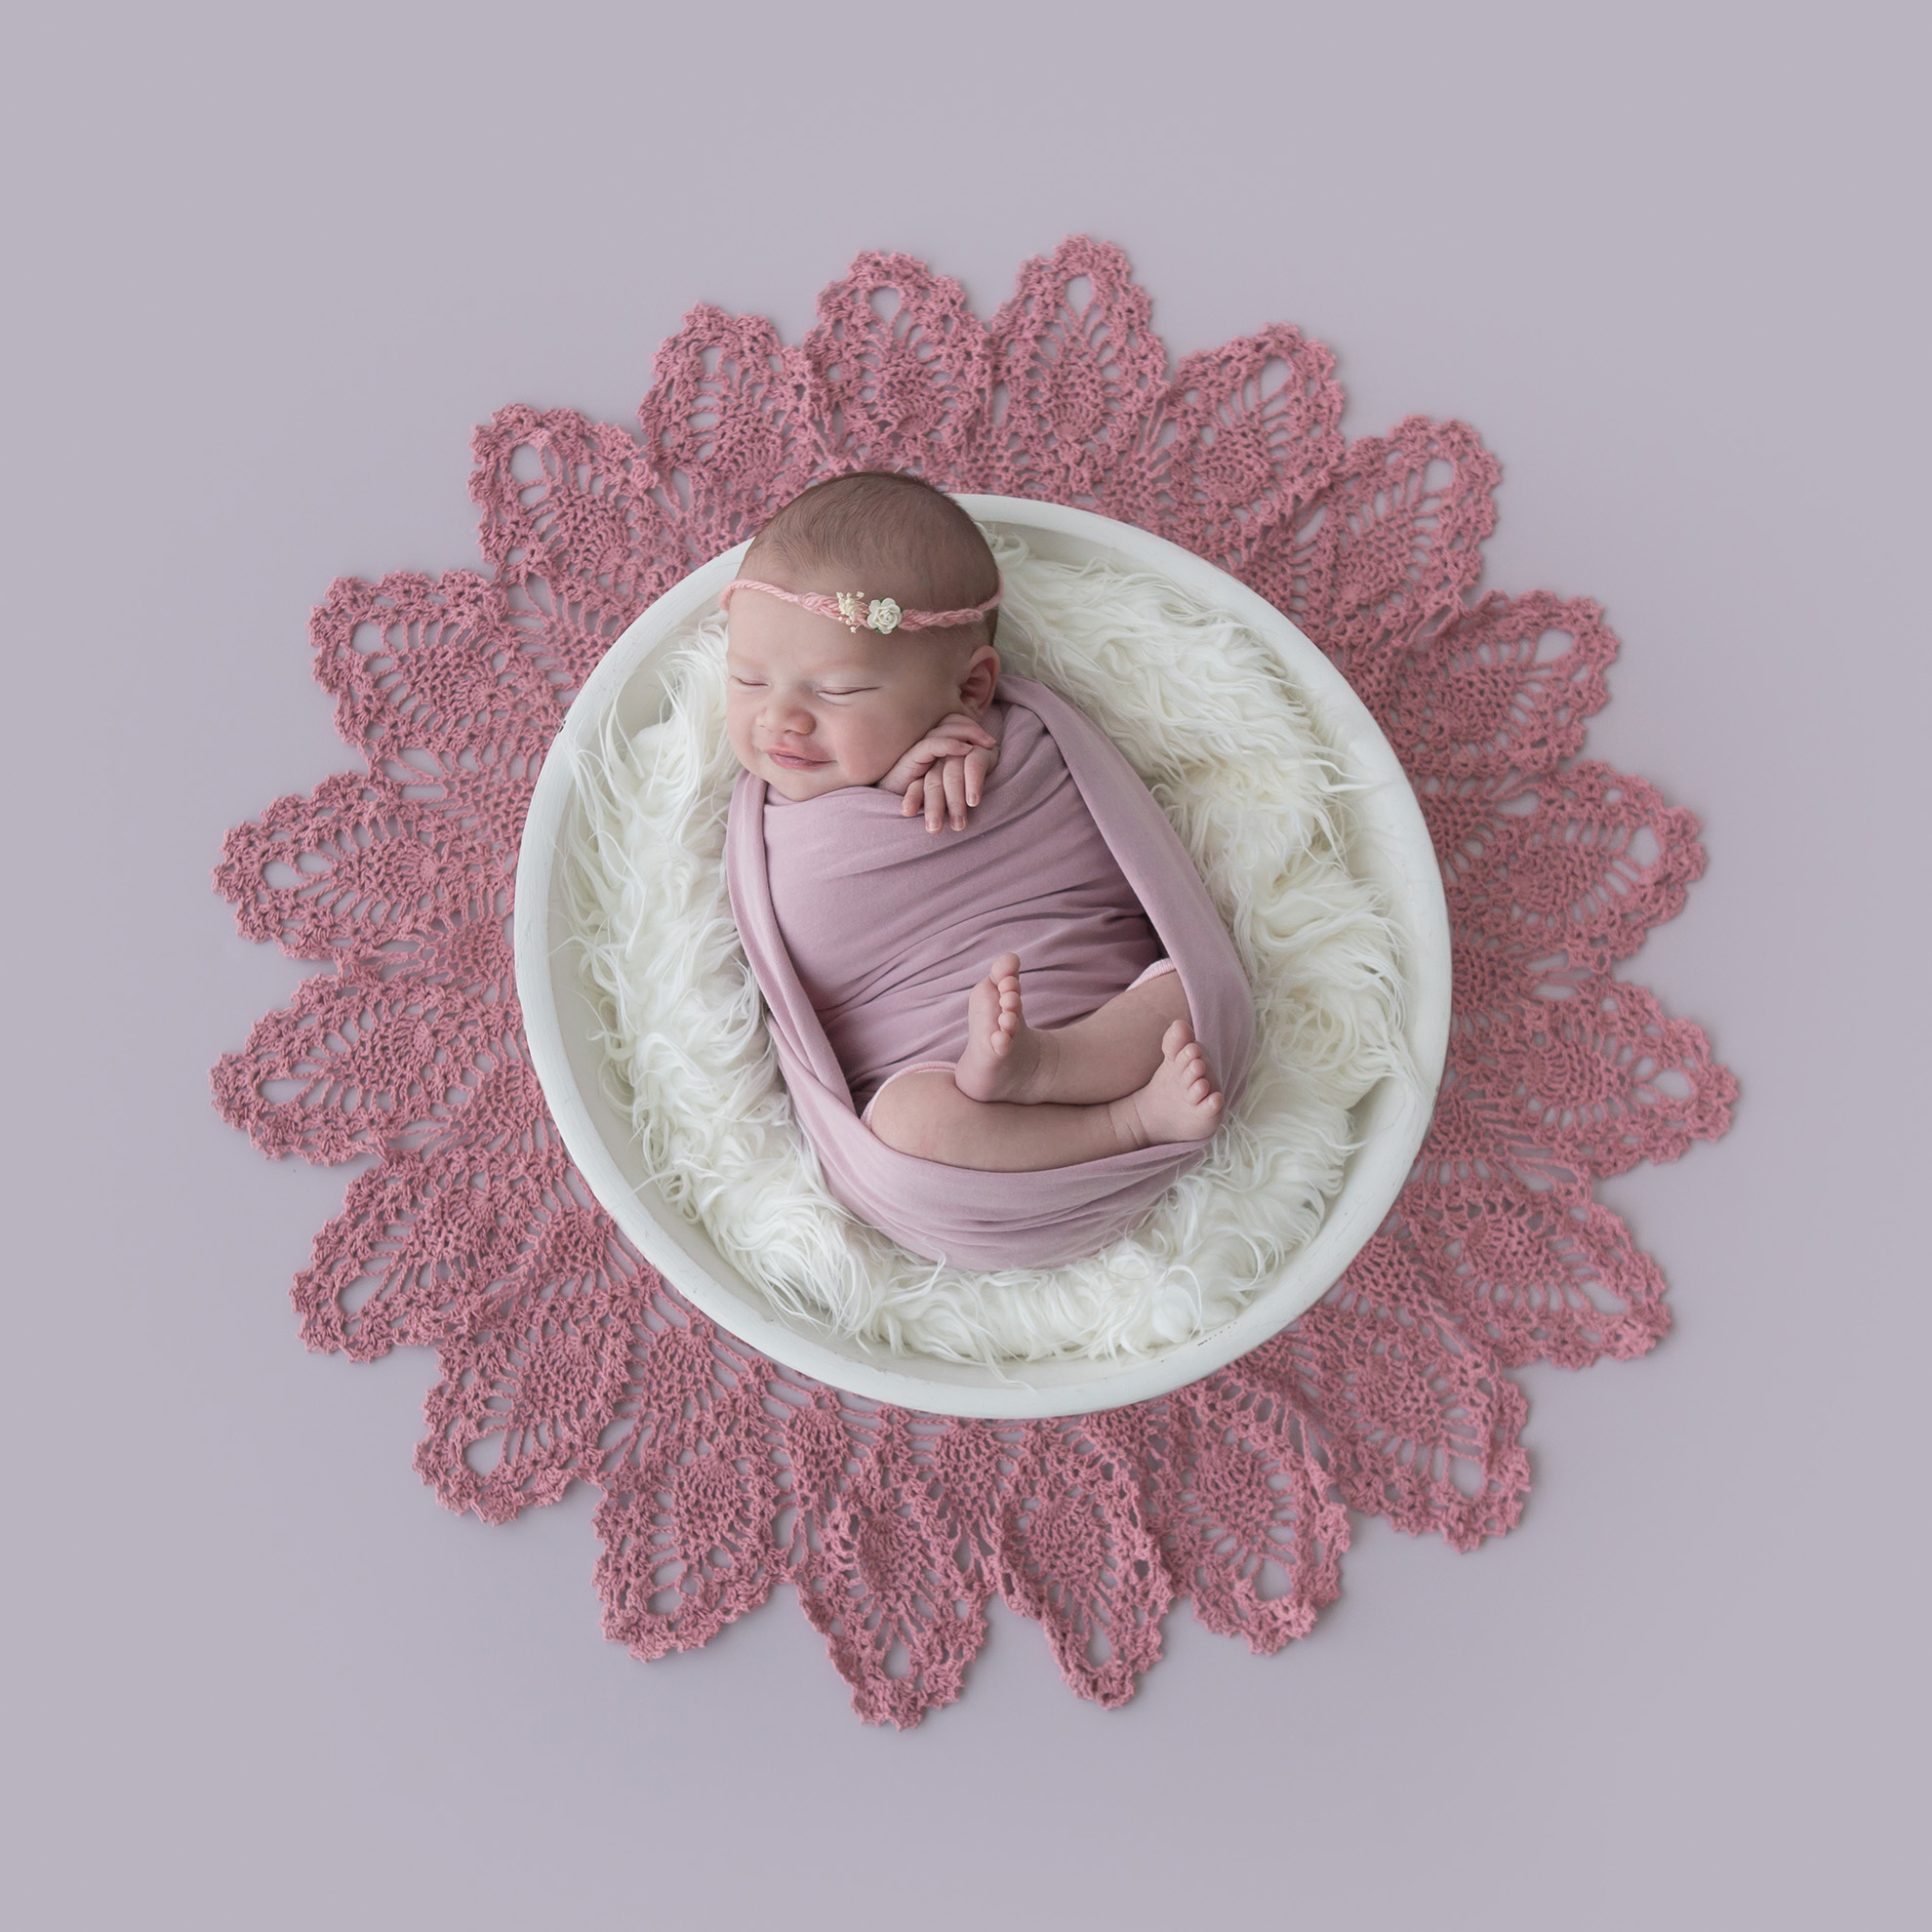 Newborn-baby-photography-dusty-pinks.jpg